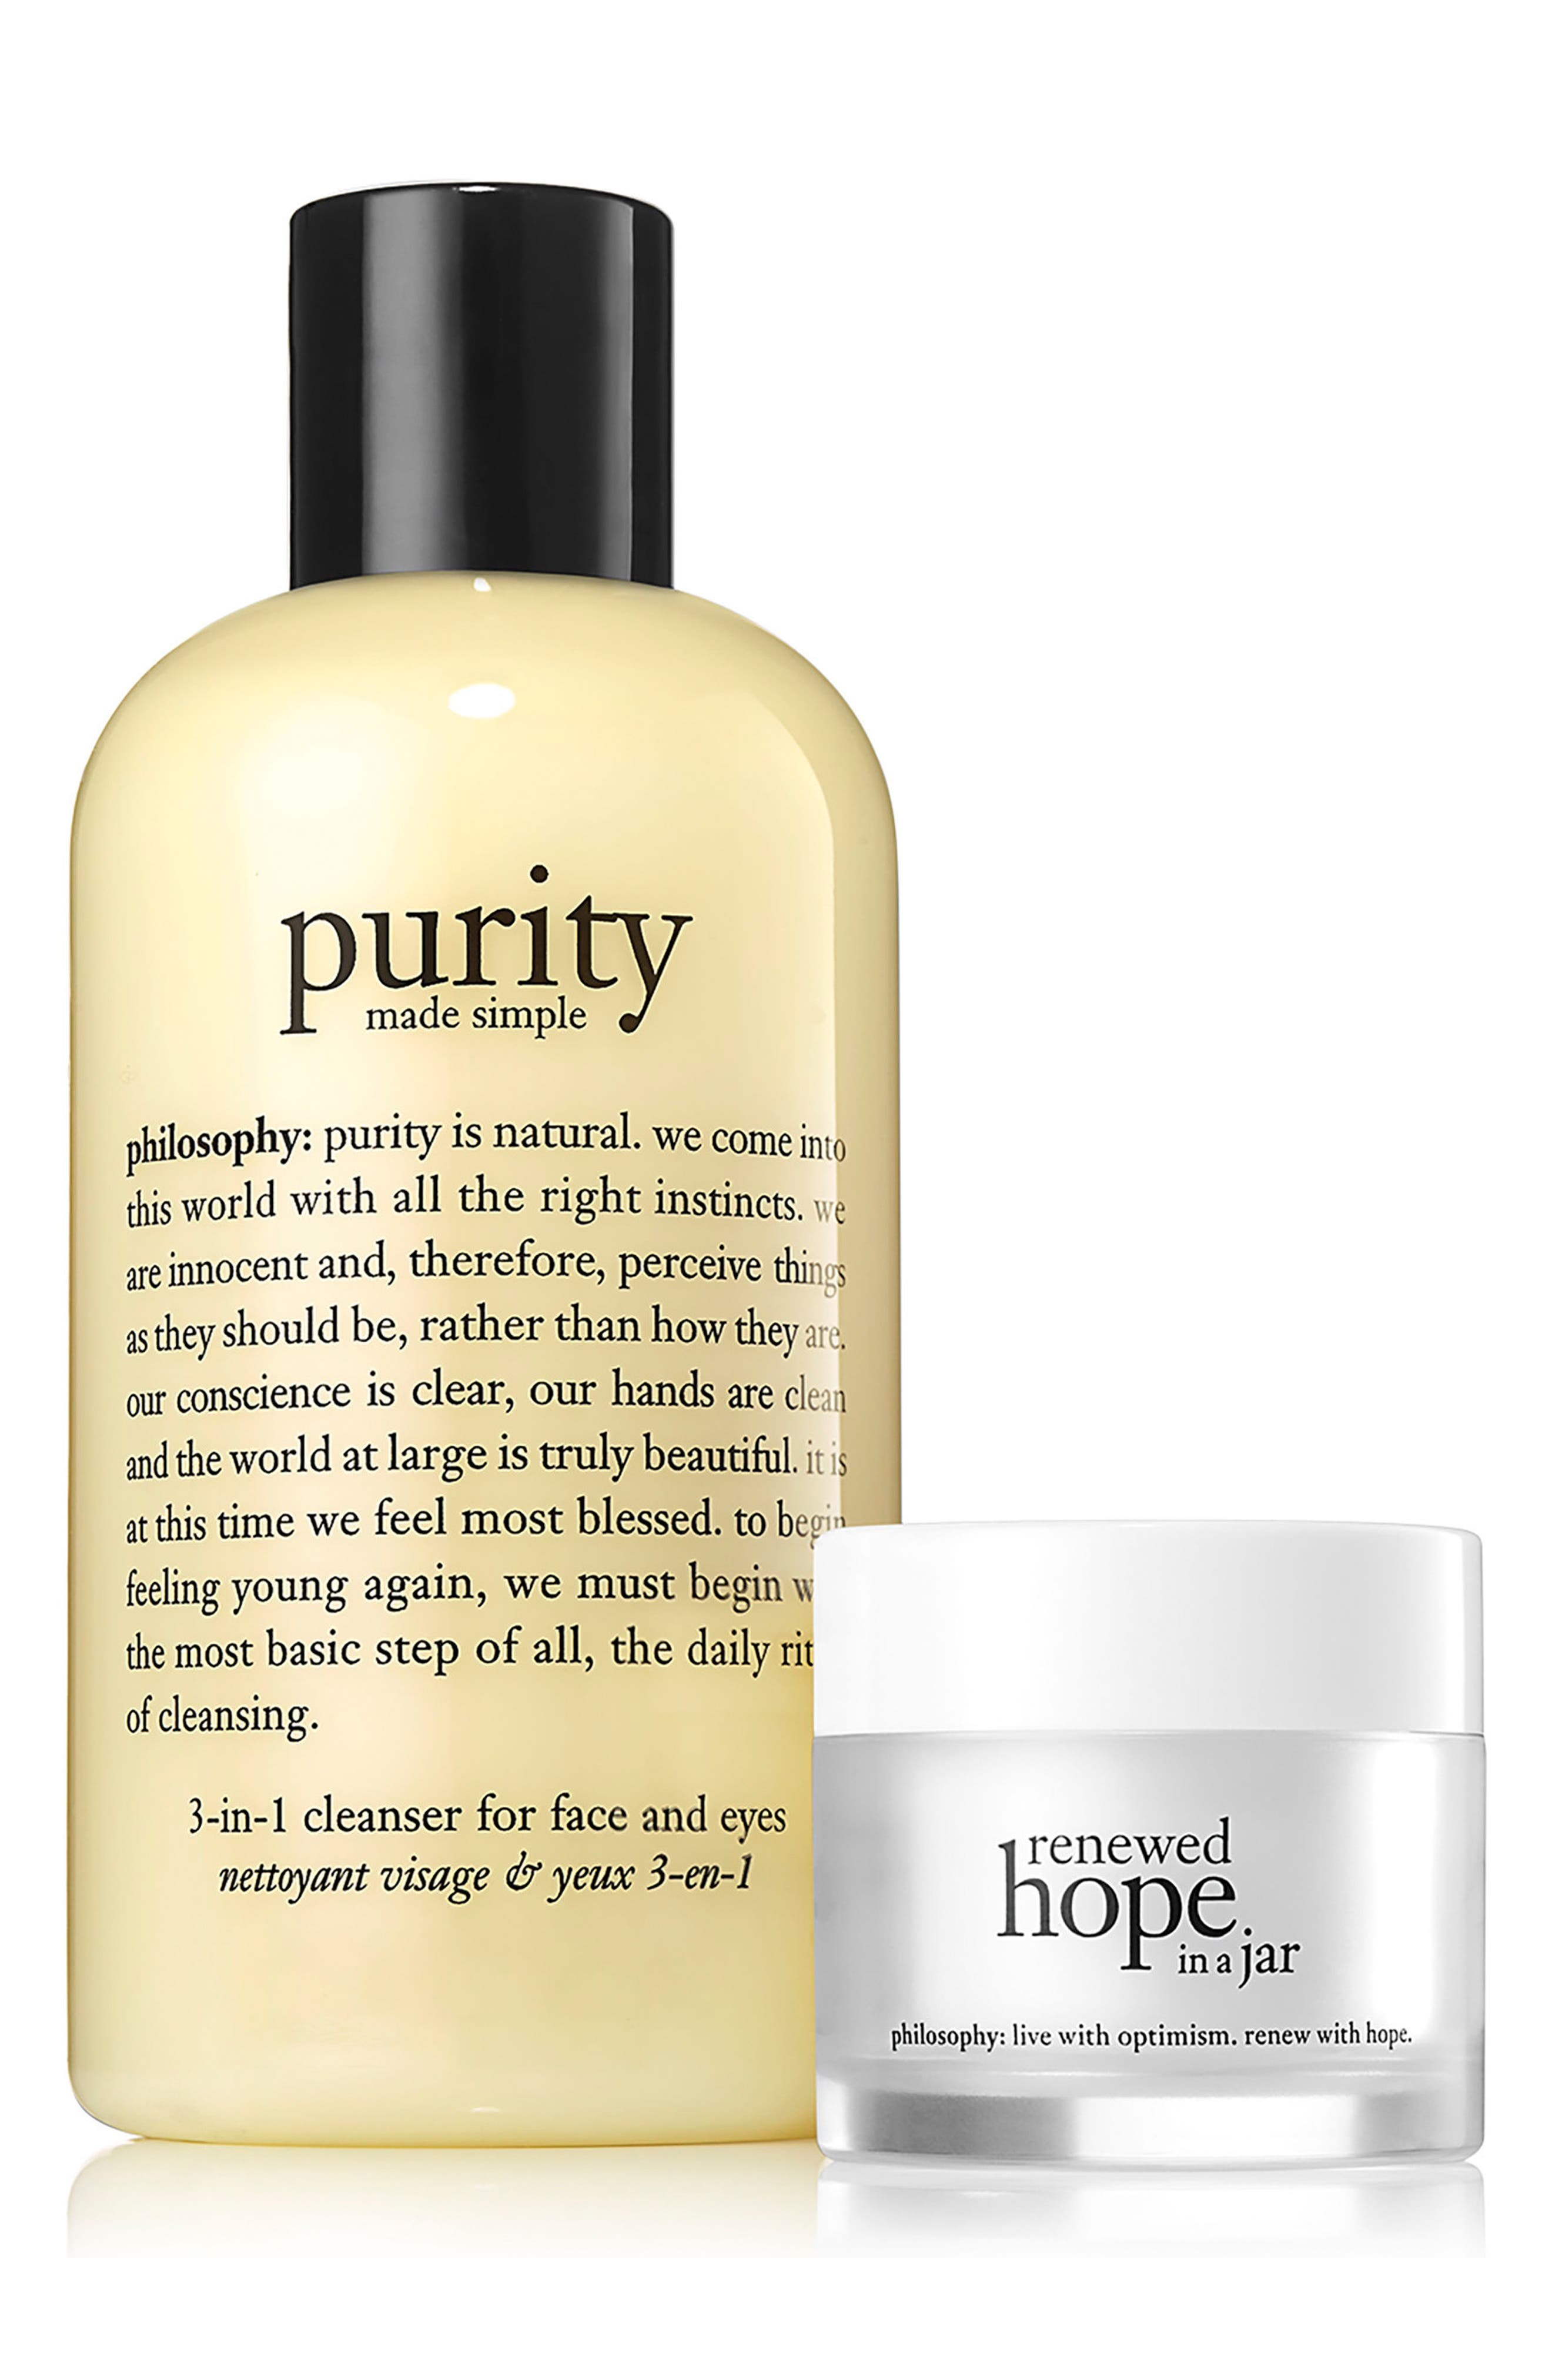 philosophy purity made simple & renewed hope duo